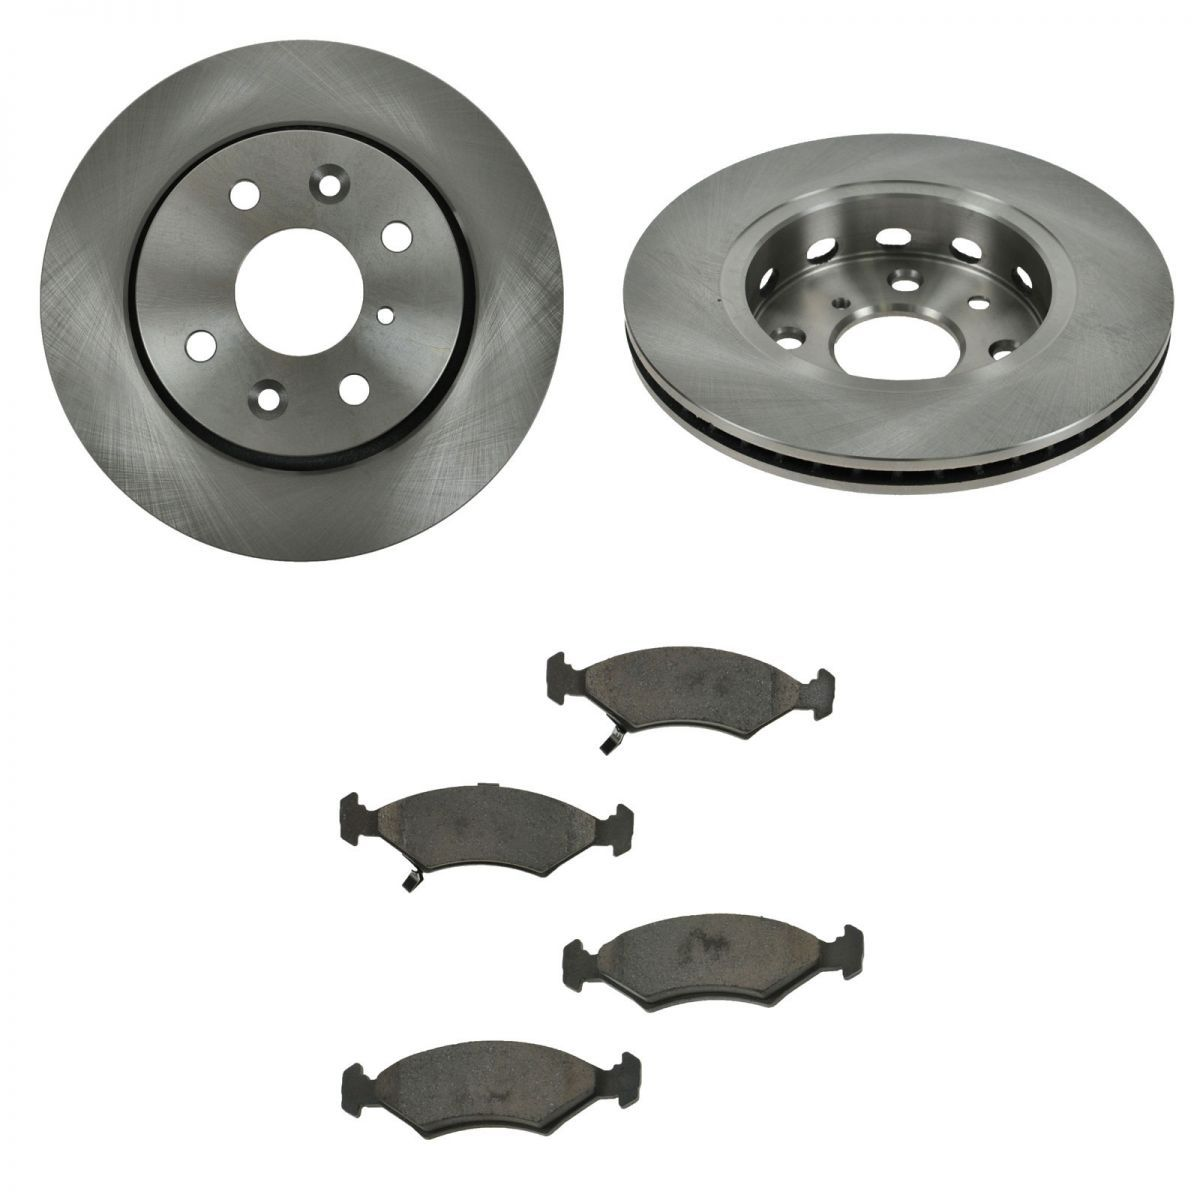 Front ceramic disc brake pads rotors kit set for kia